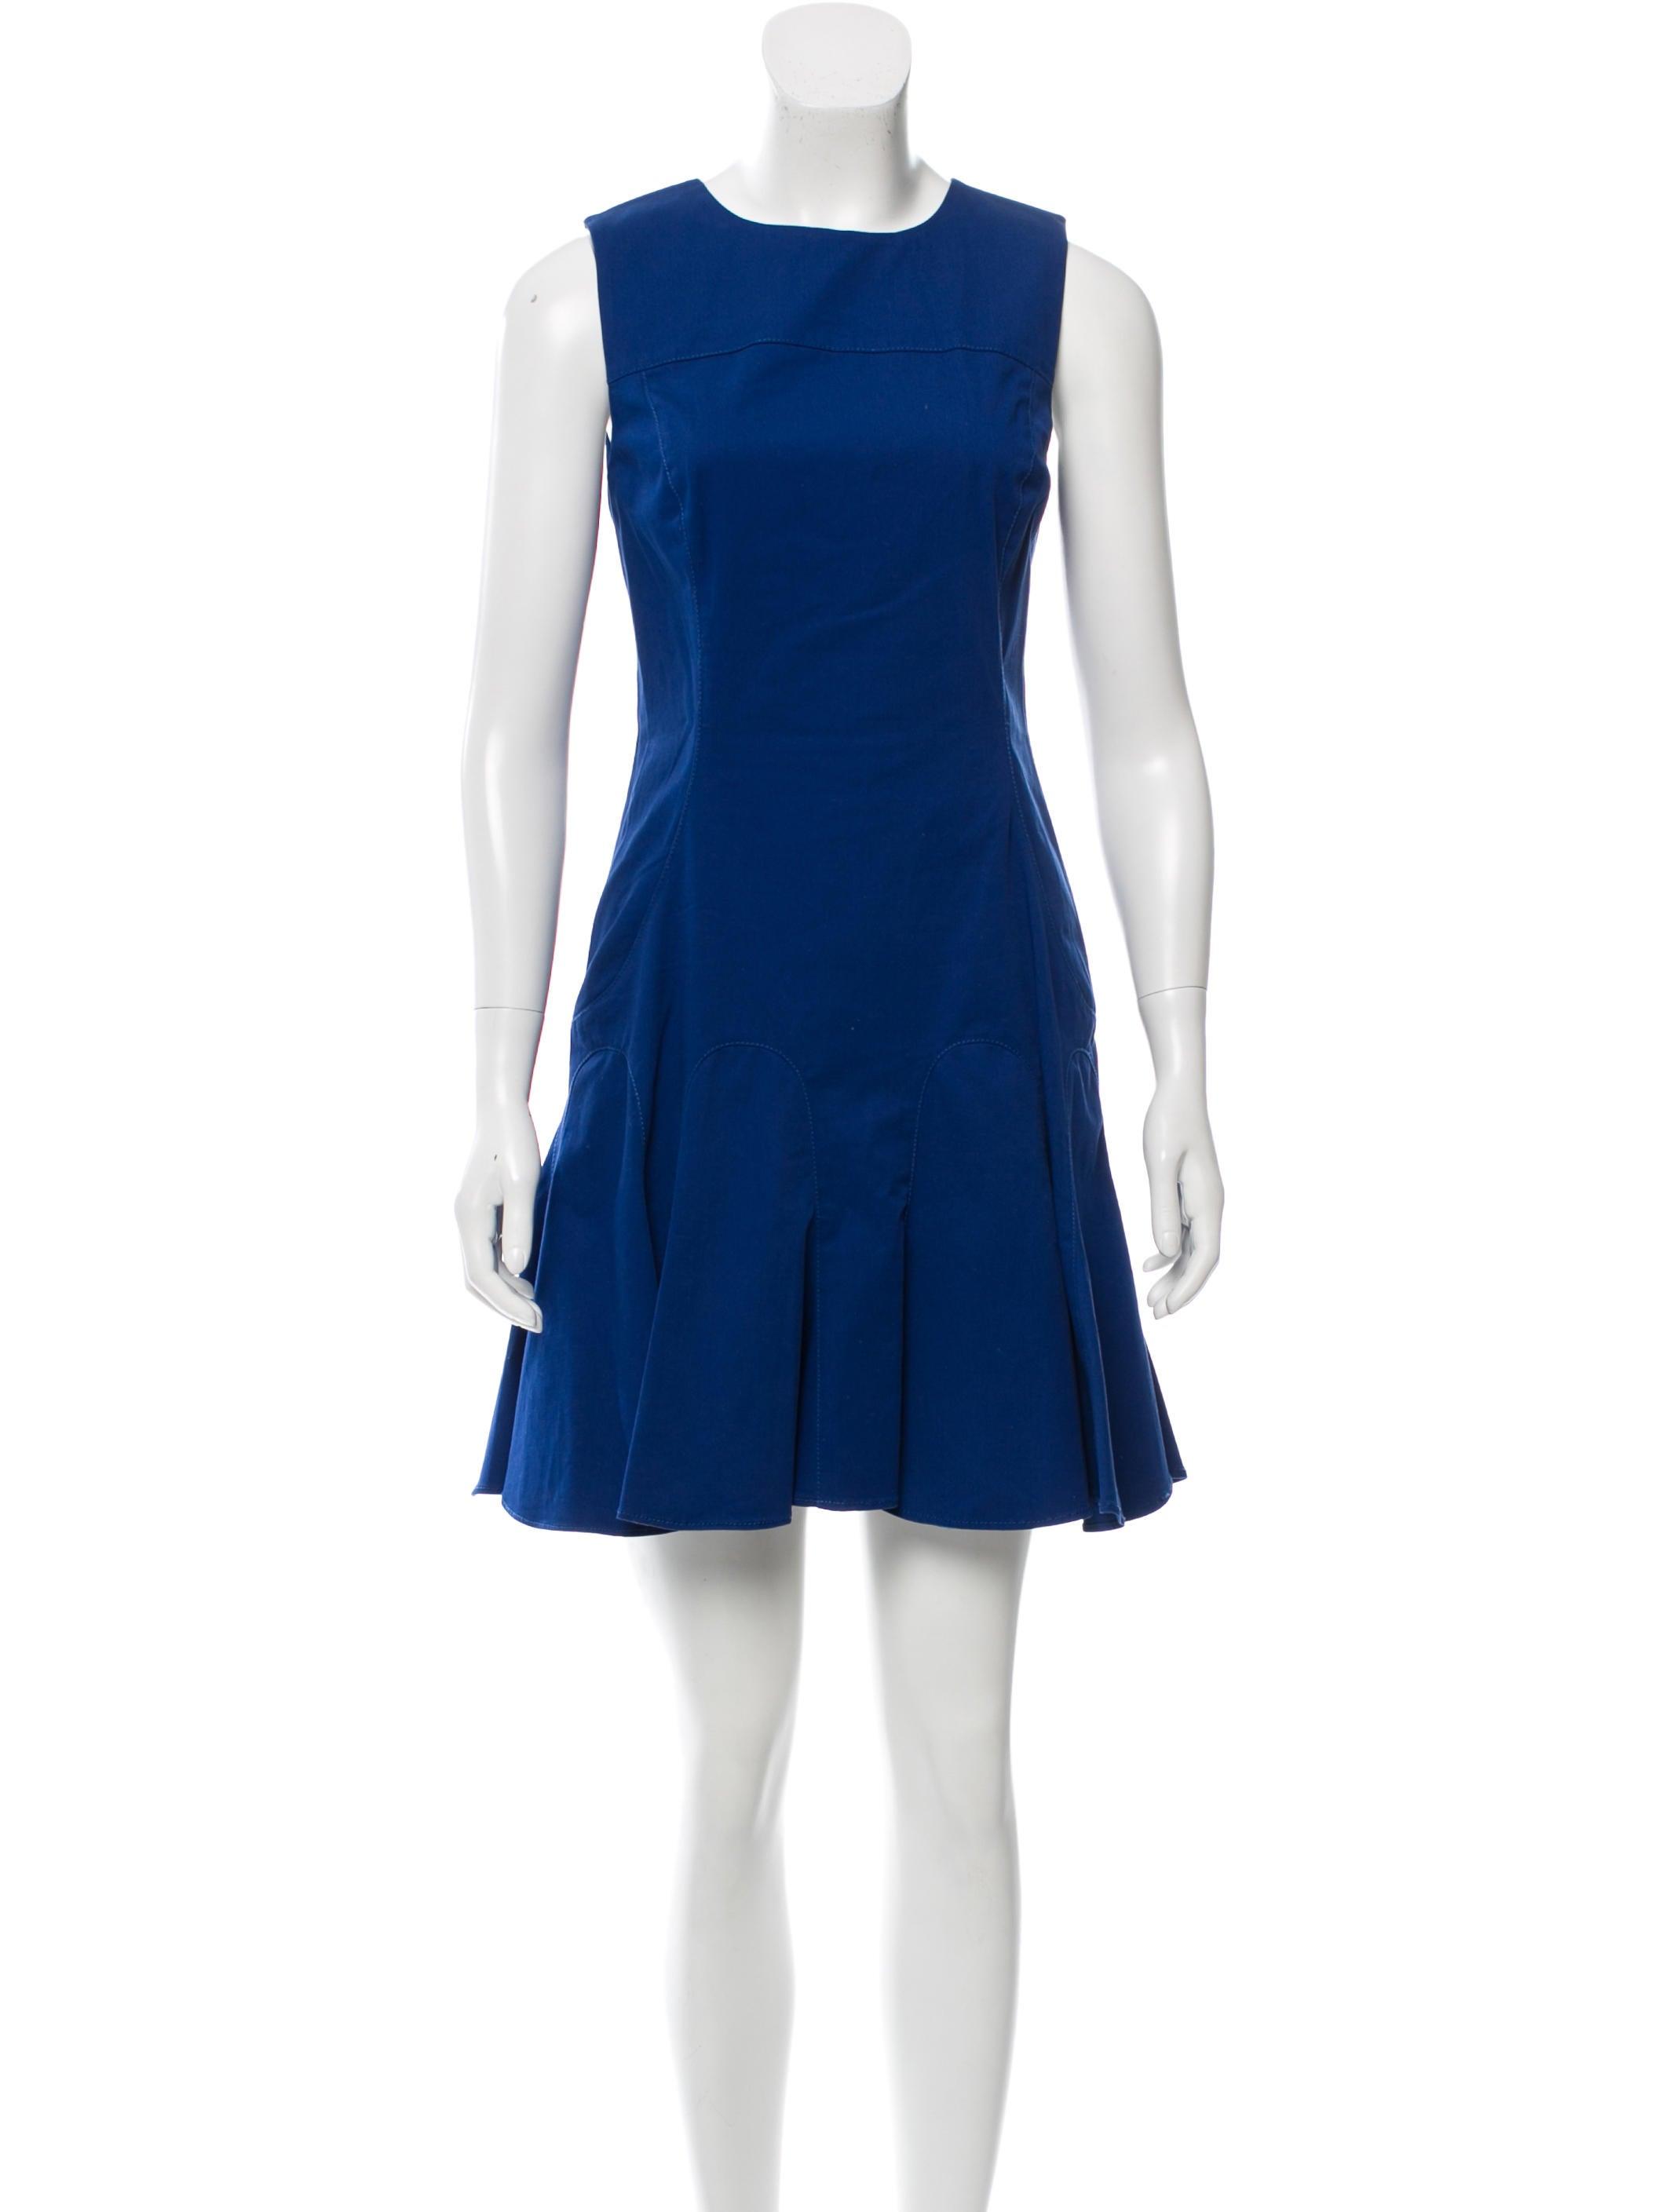 Derek Lam 10 Crosby Sleeveless Mini Dress Clothing